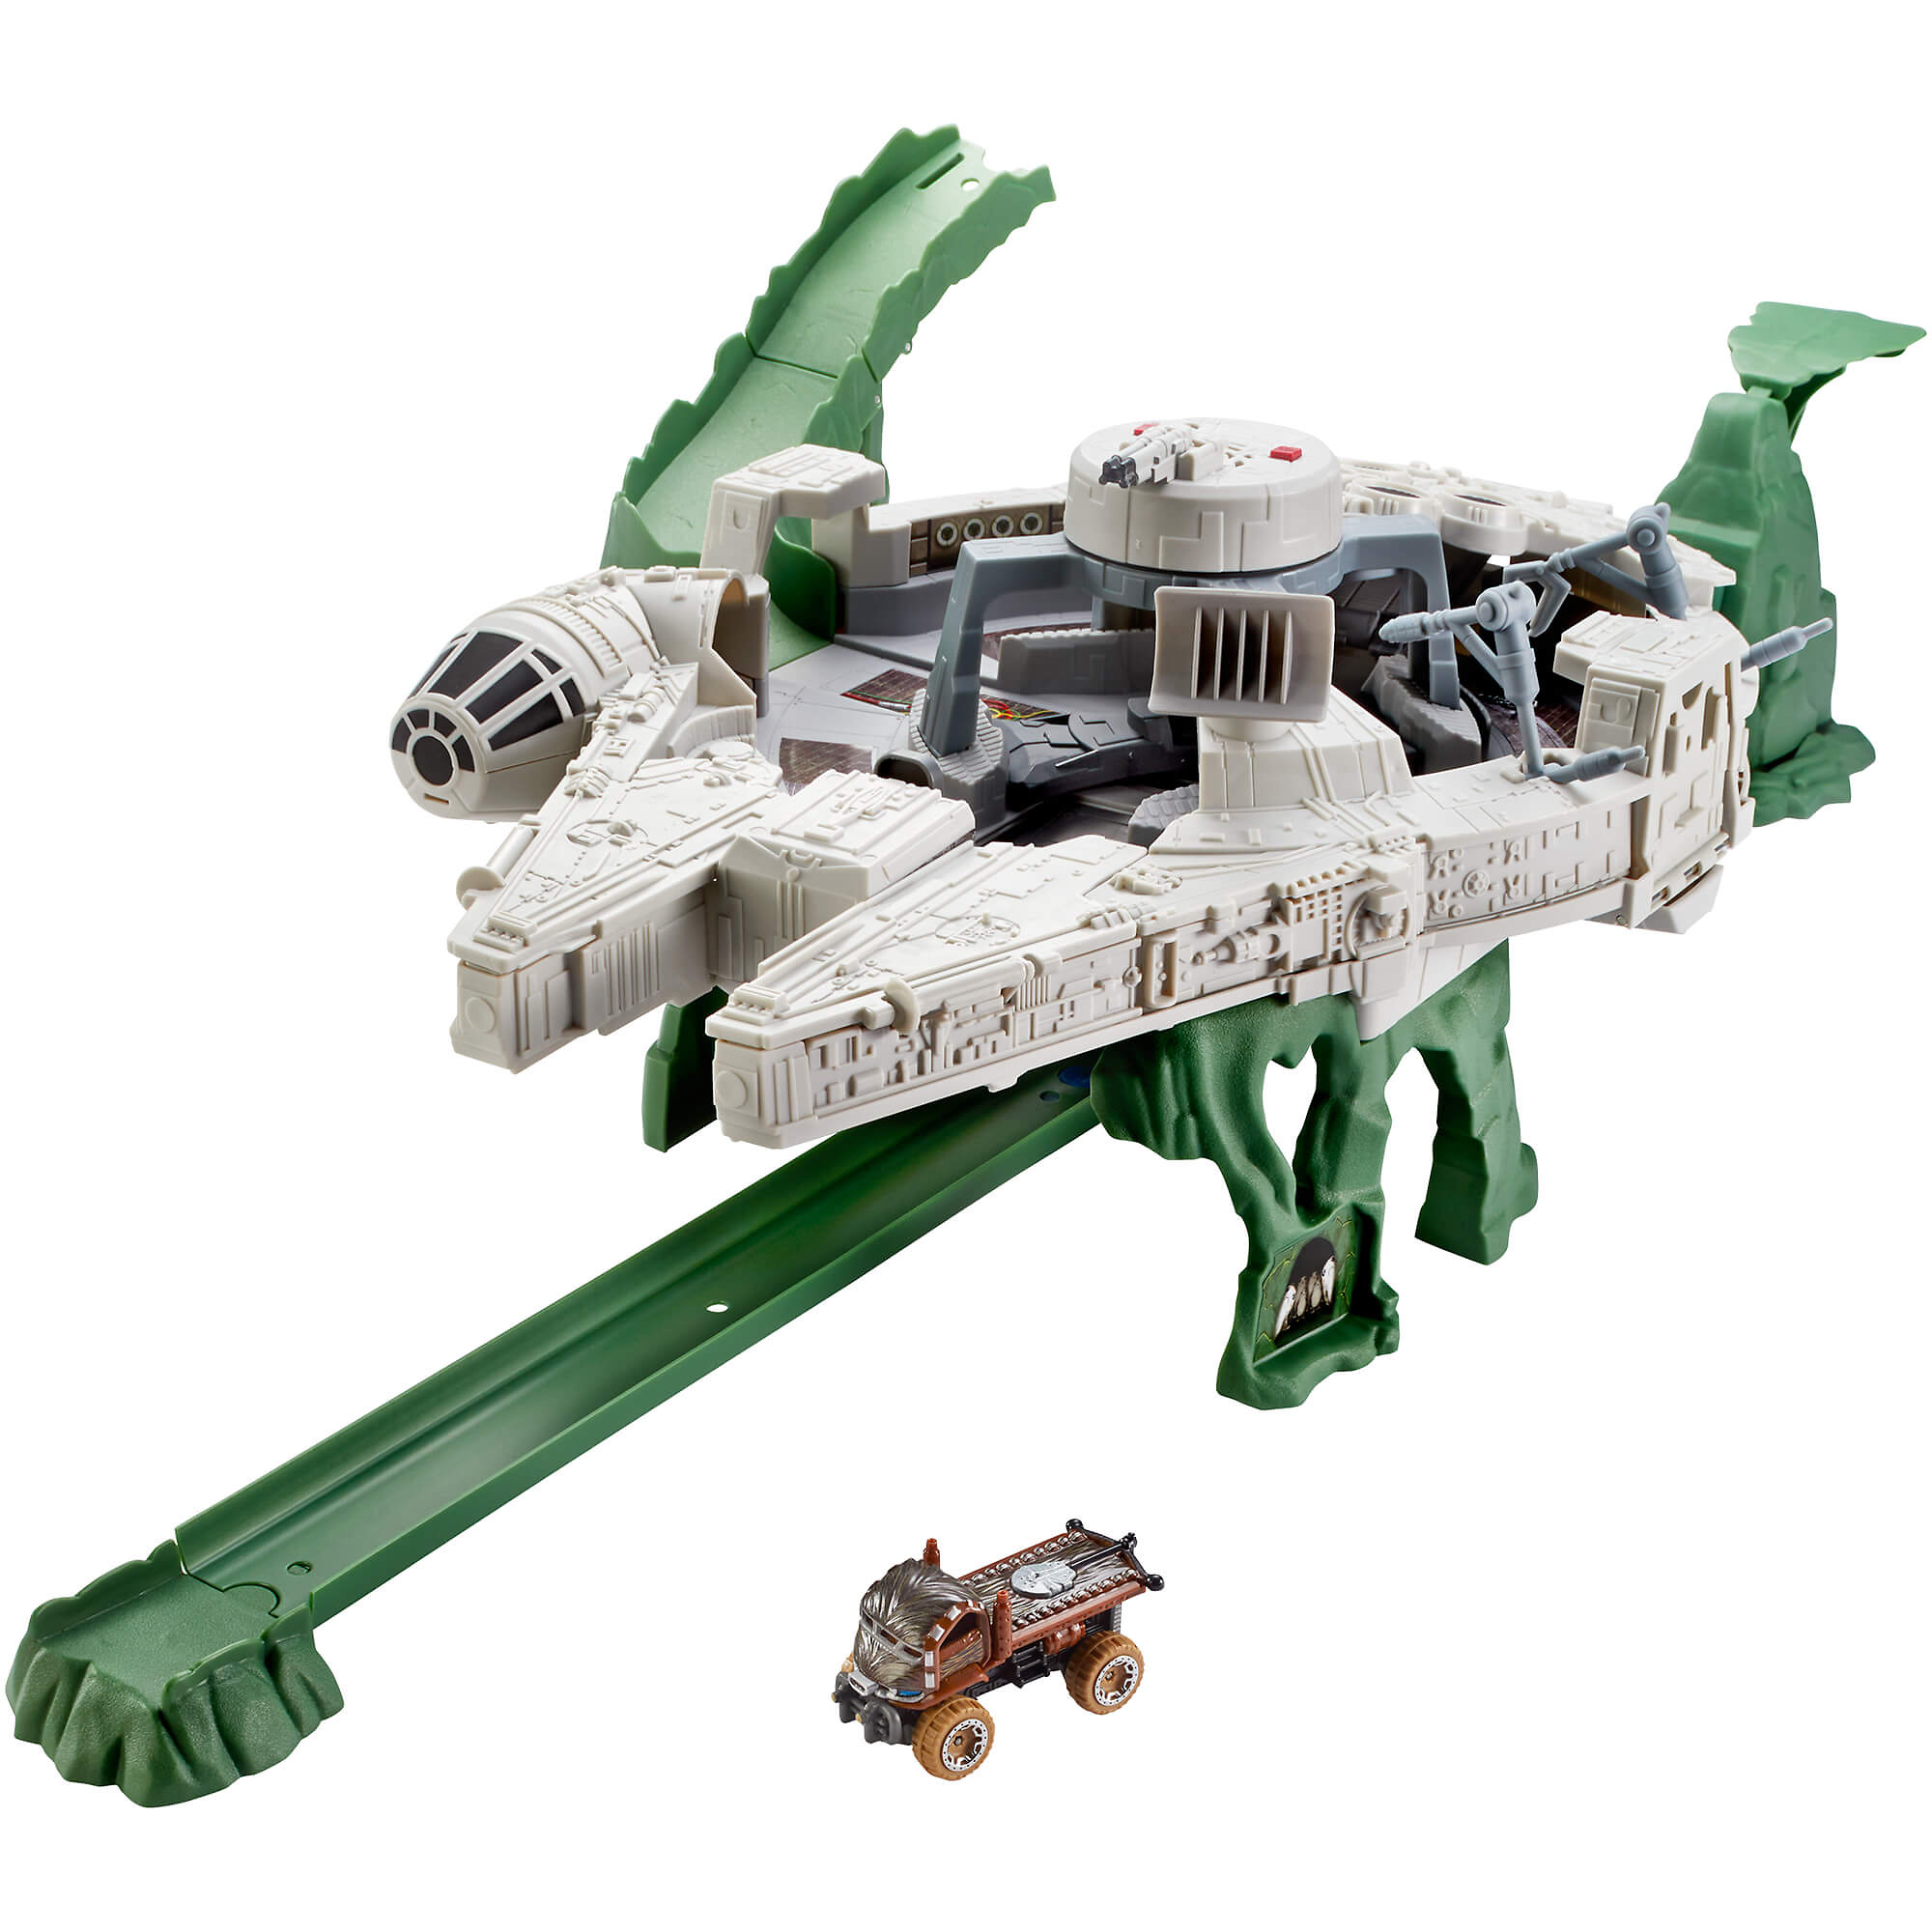 Hot Wheels Star Wars Millennium Falcon Character Car Track Set by Mattel